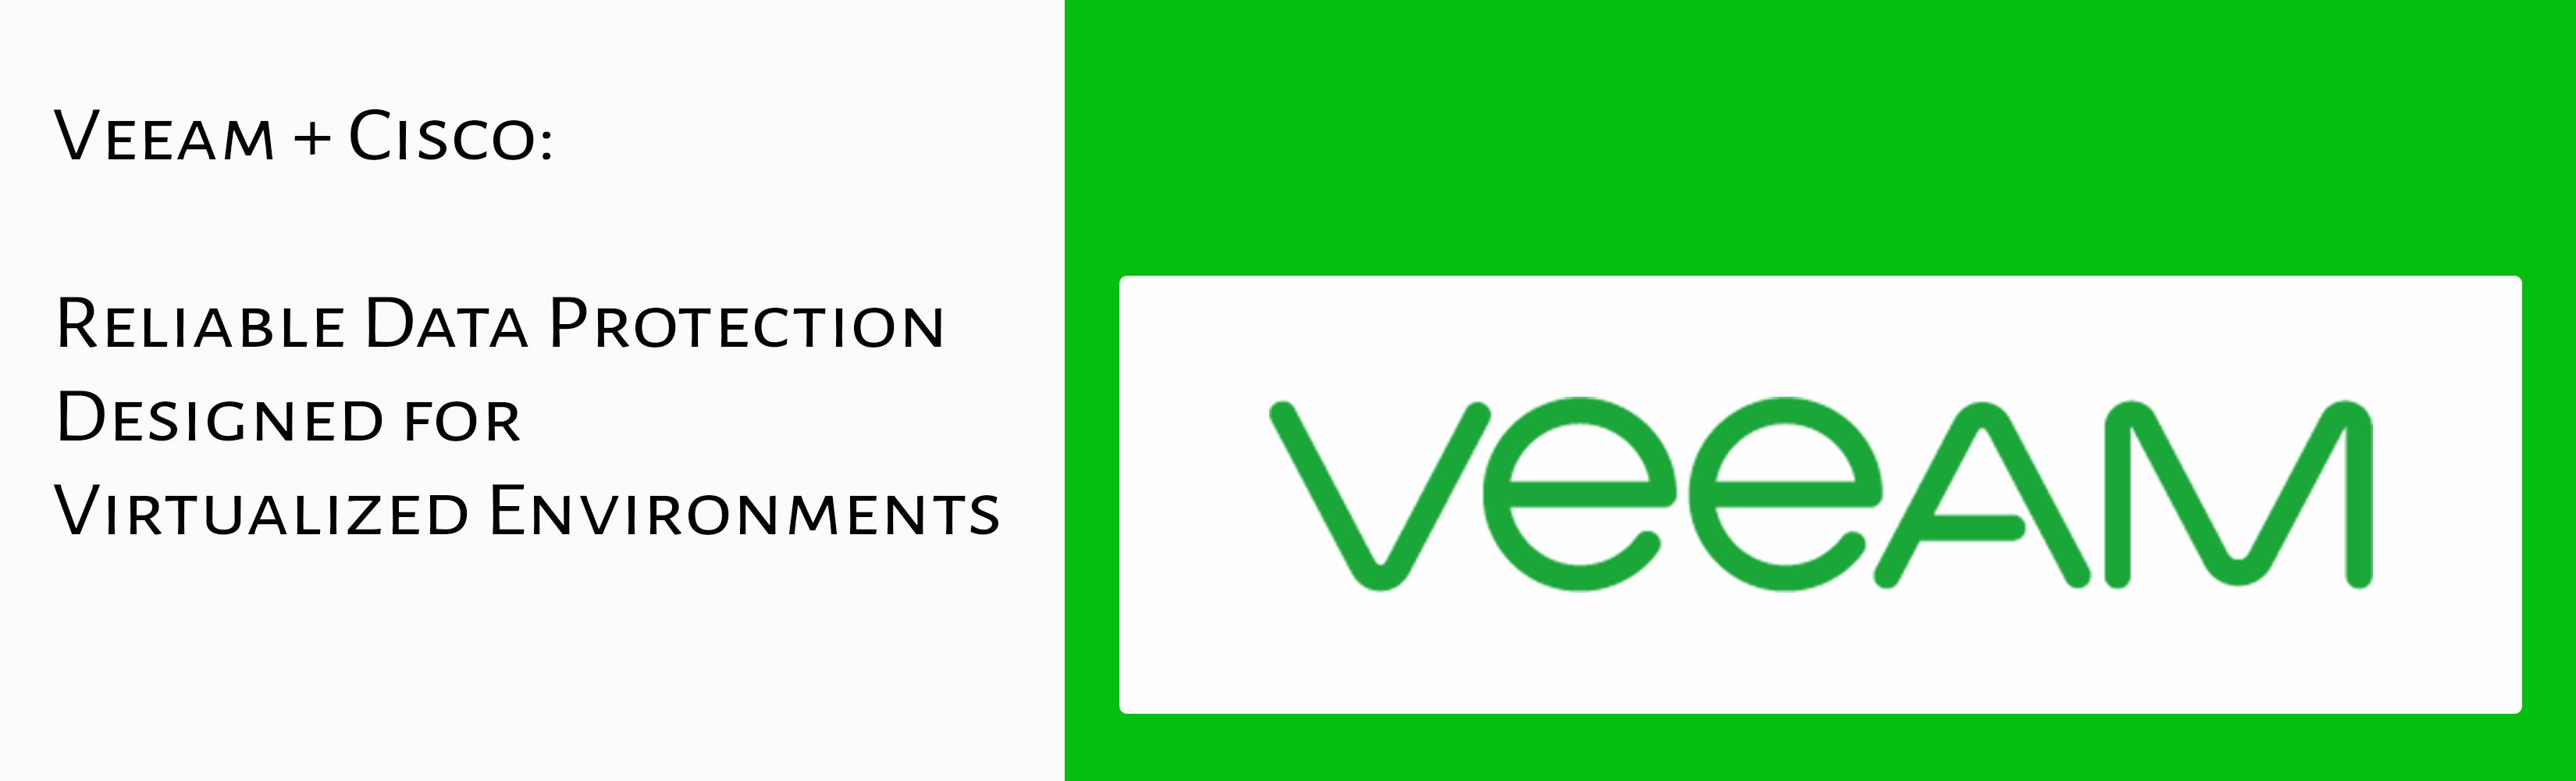 Veeam + Cisco_Reliable Data Protection